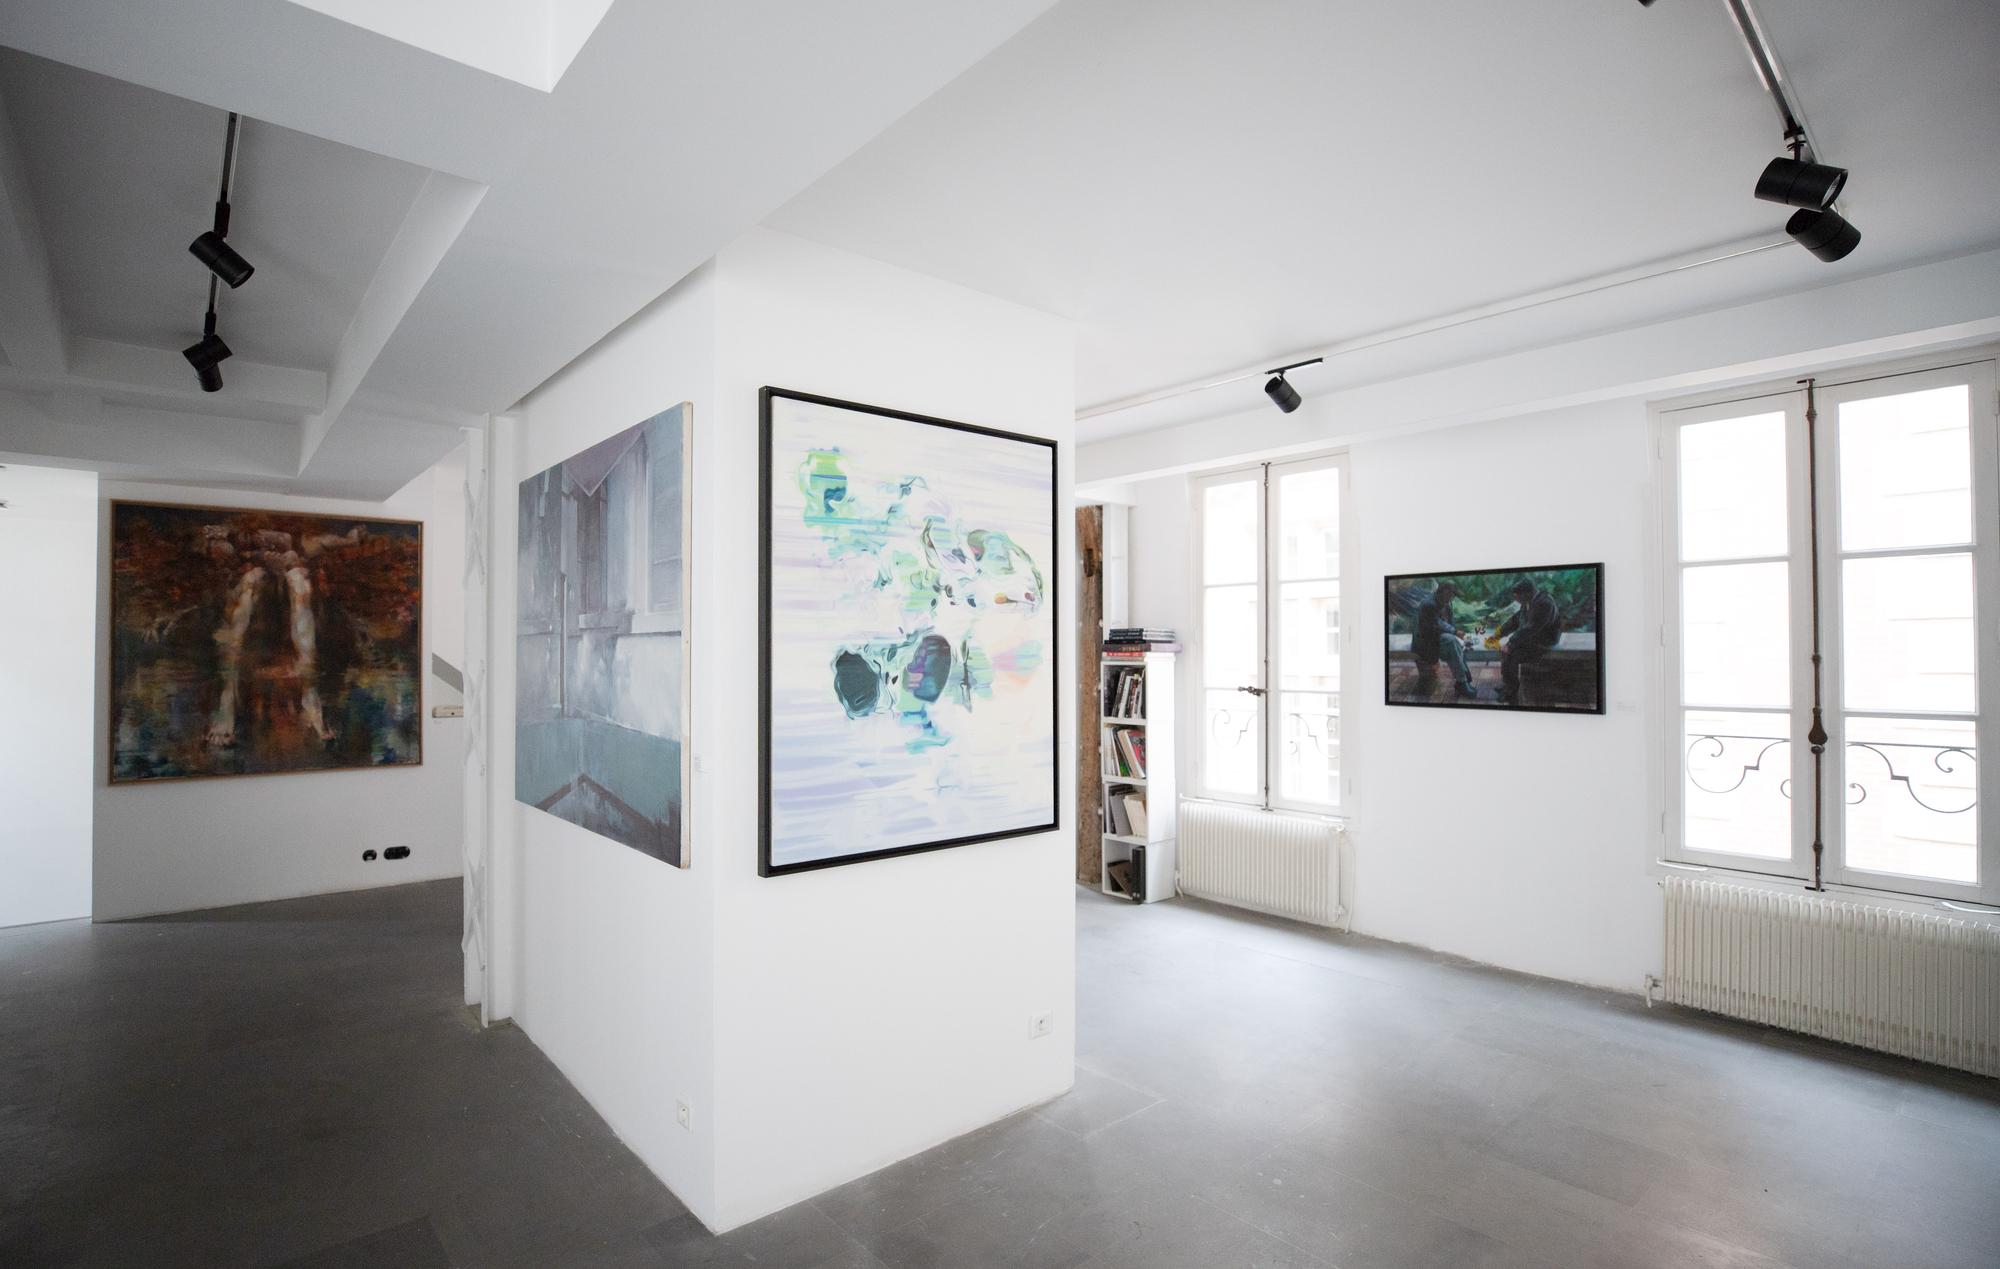 A2z art gallery exposition paris art contemporain 12 1 original